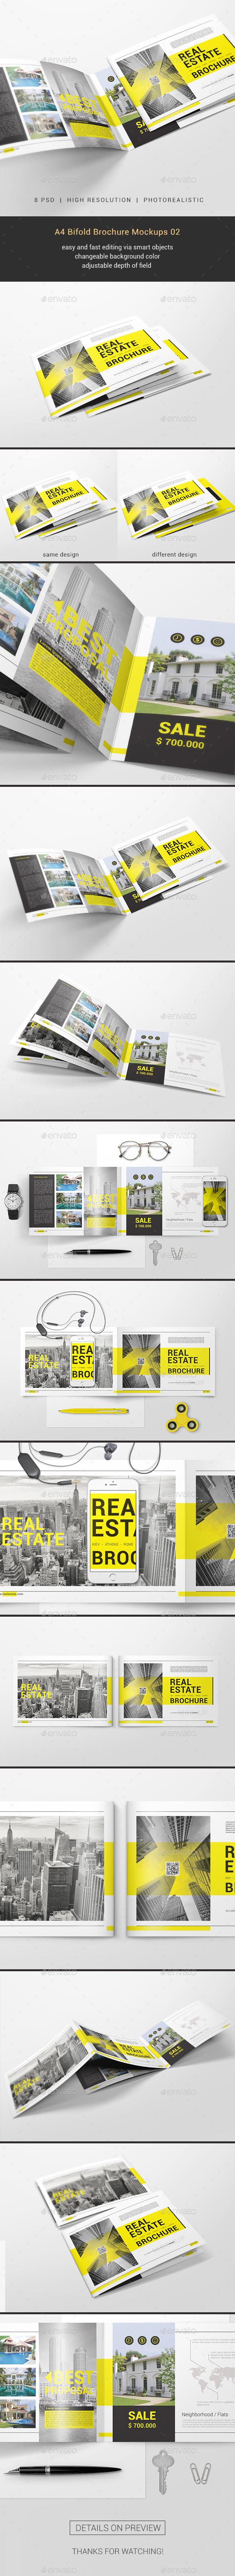 GraphicRiver A4 Bifold Brochure Mockups 02 20772899